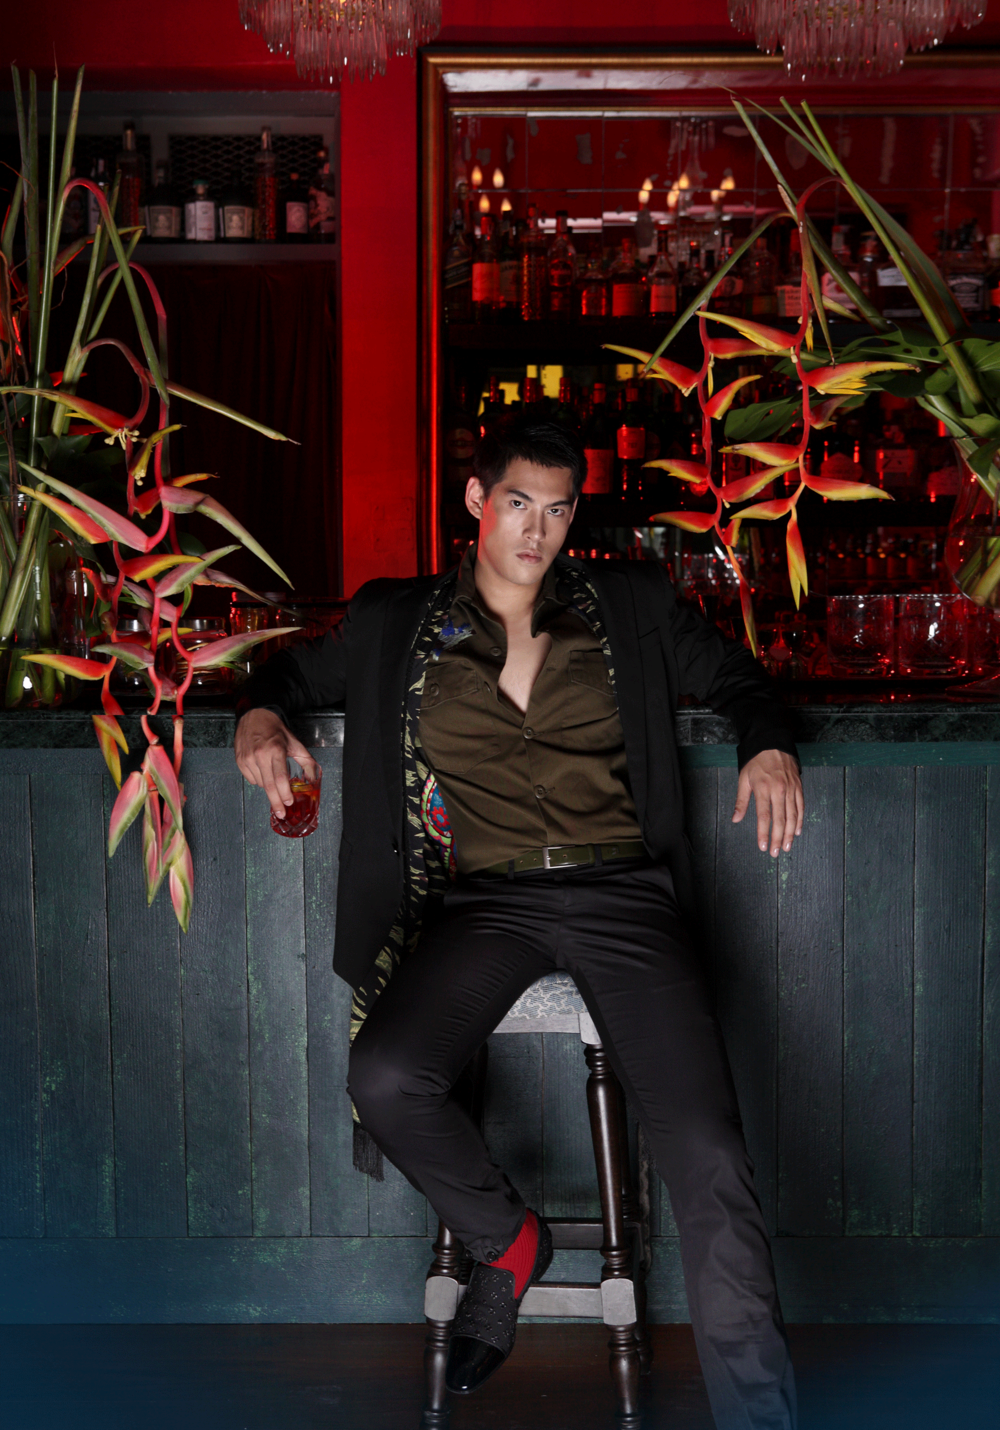 shirt : GINGER / suit : SARIT / shoes : Christian Louboutin